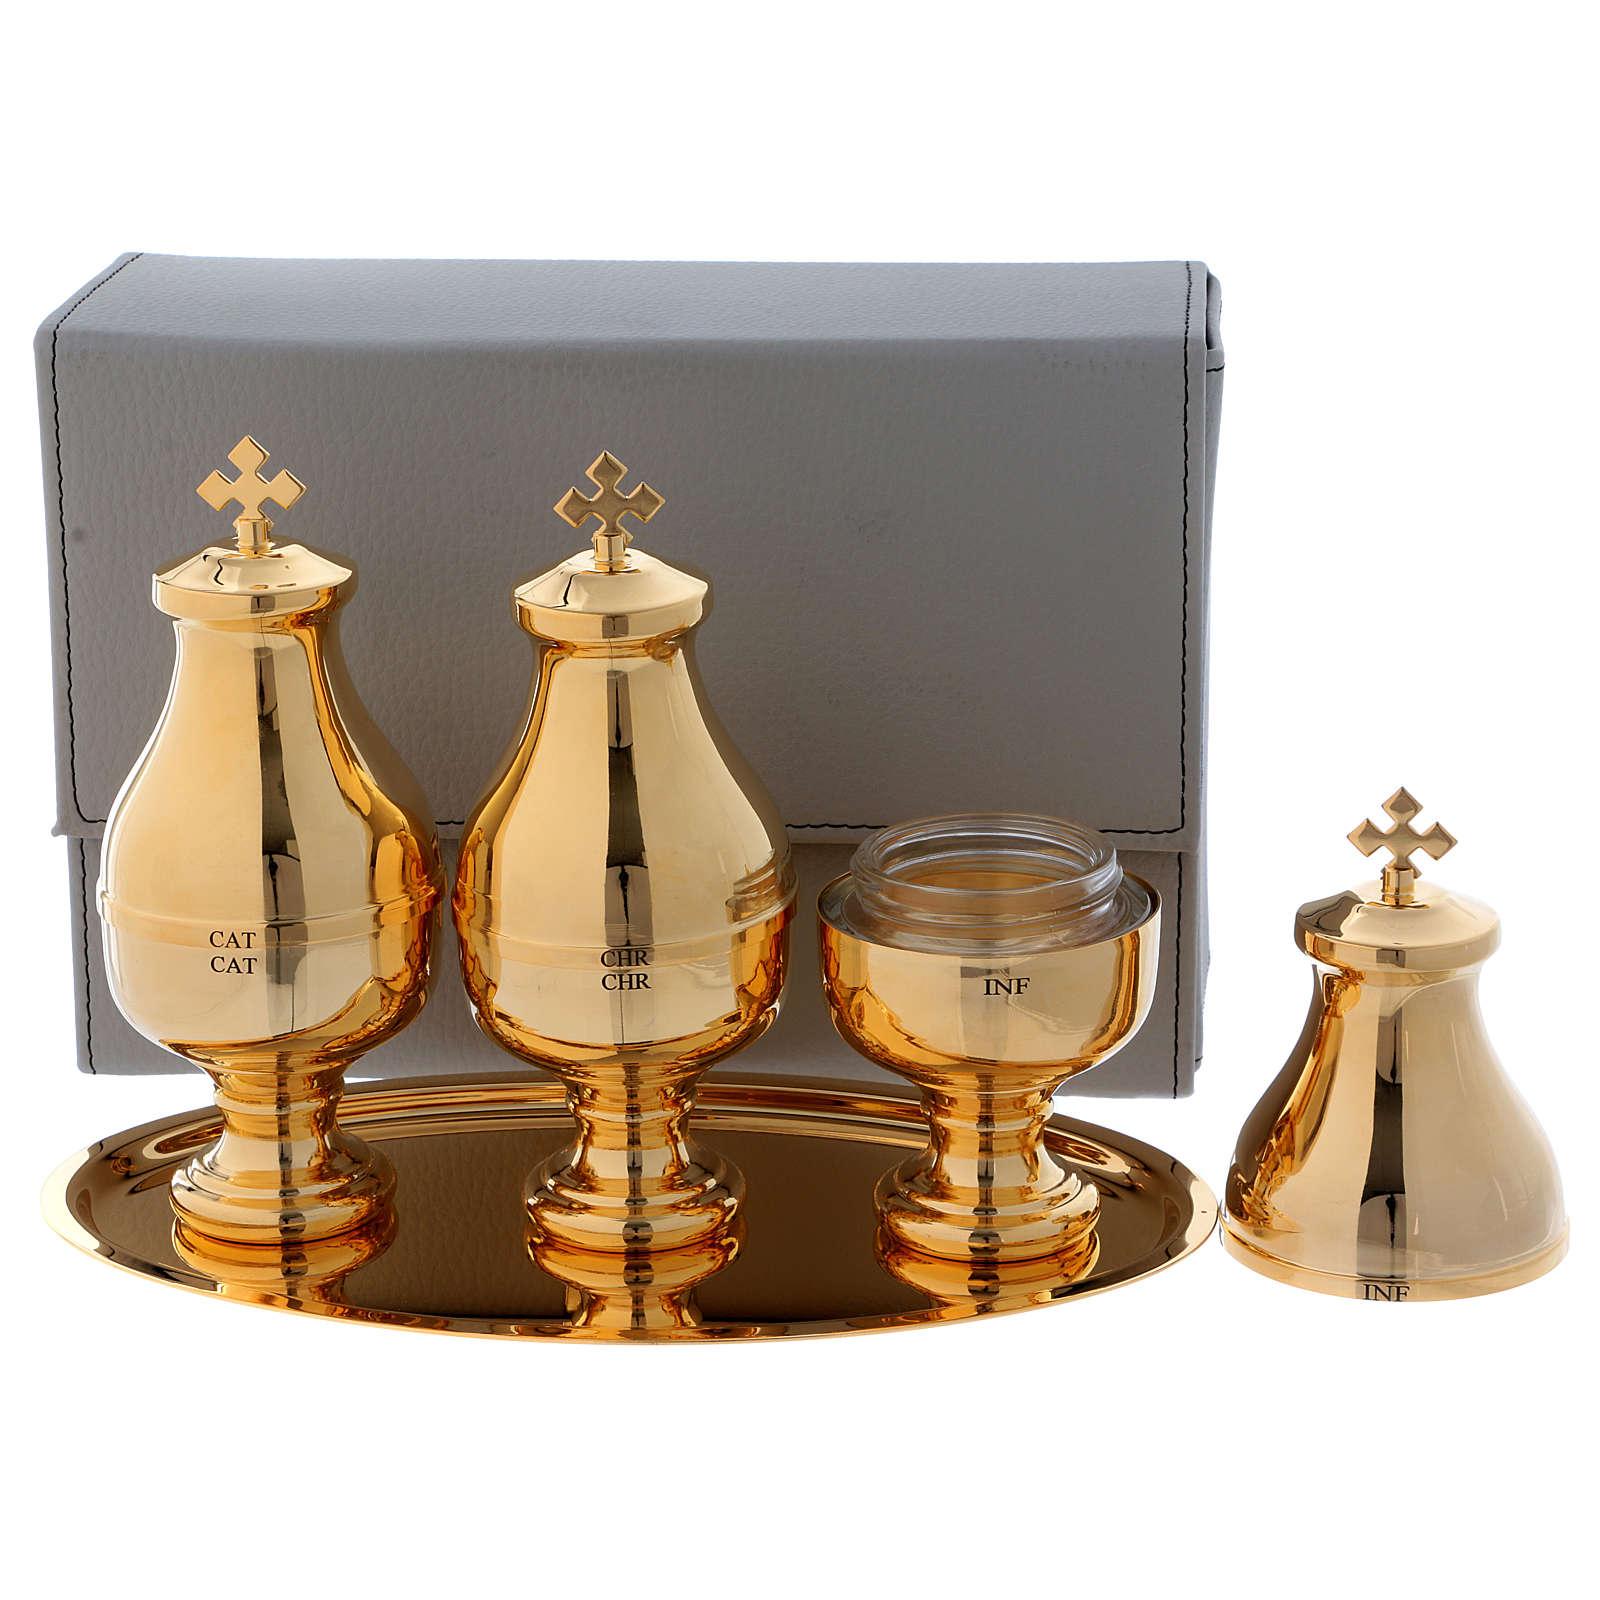 Estuche similcuero con tres frascos Crismera alto para santos óleos 3